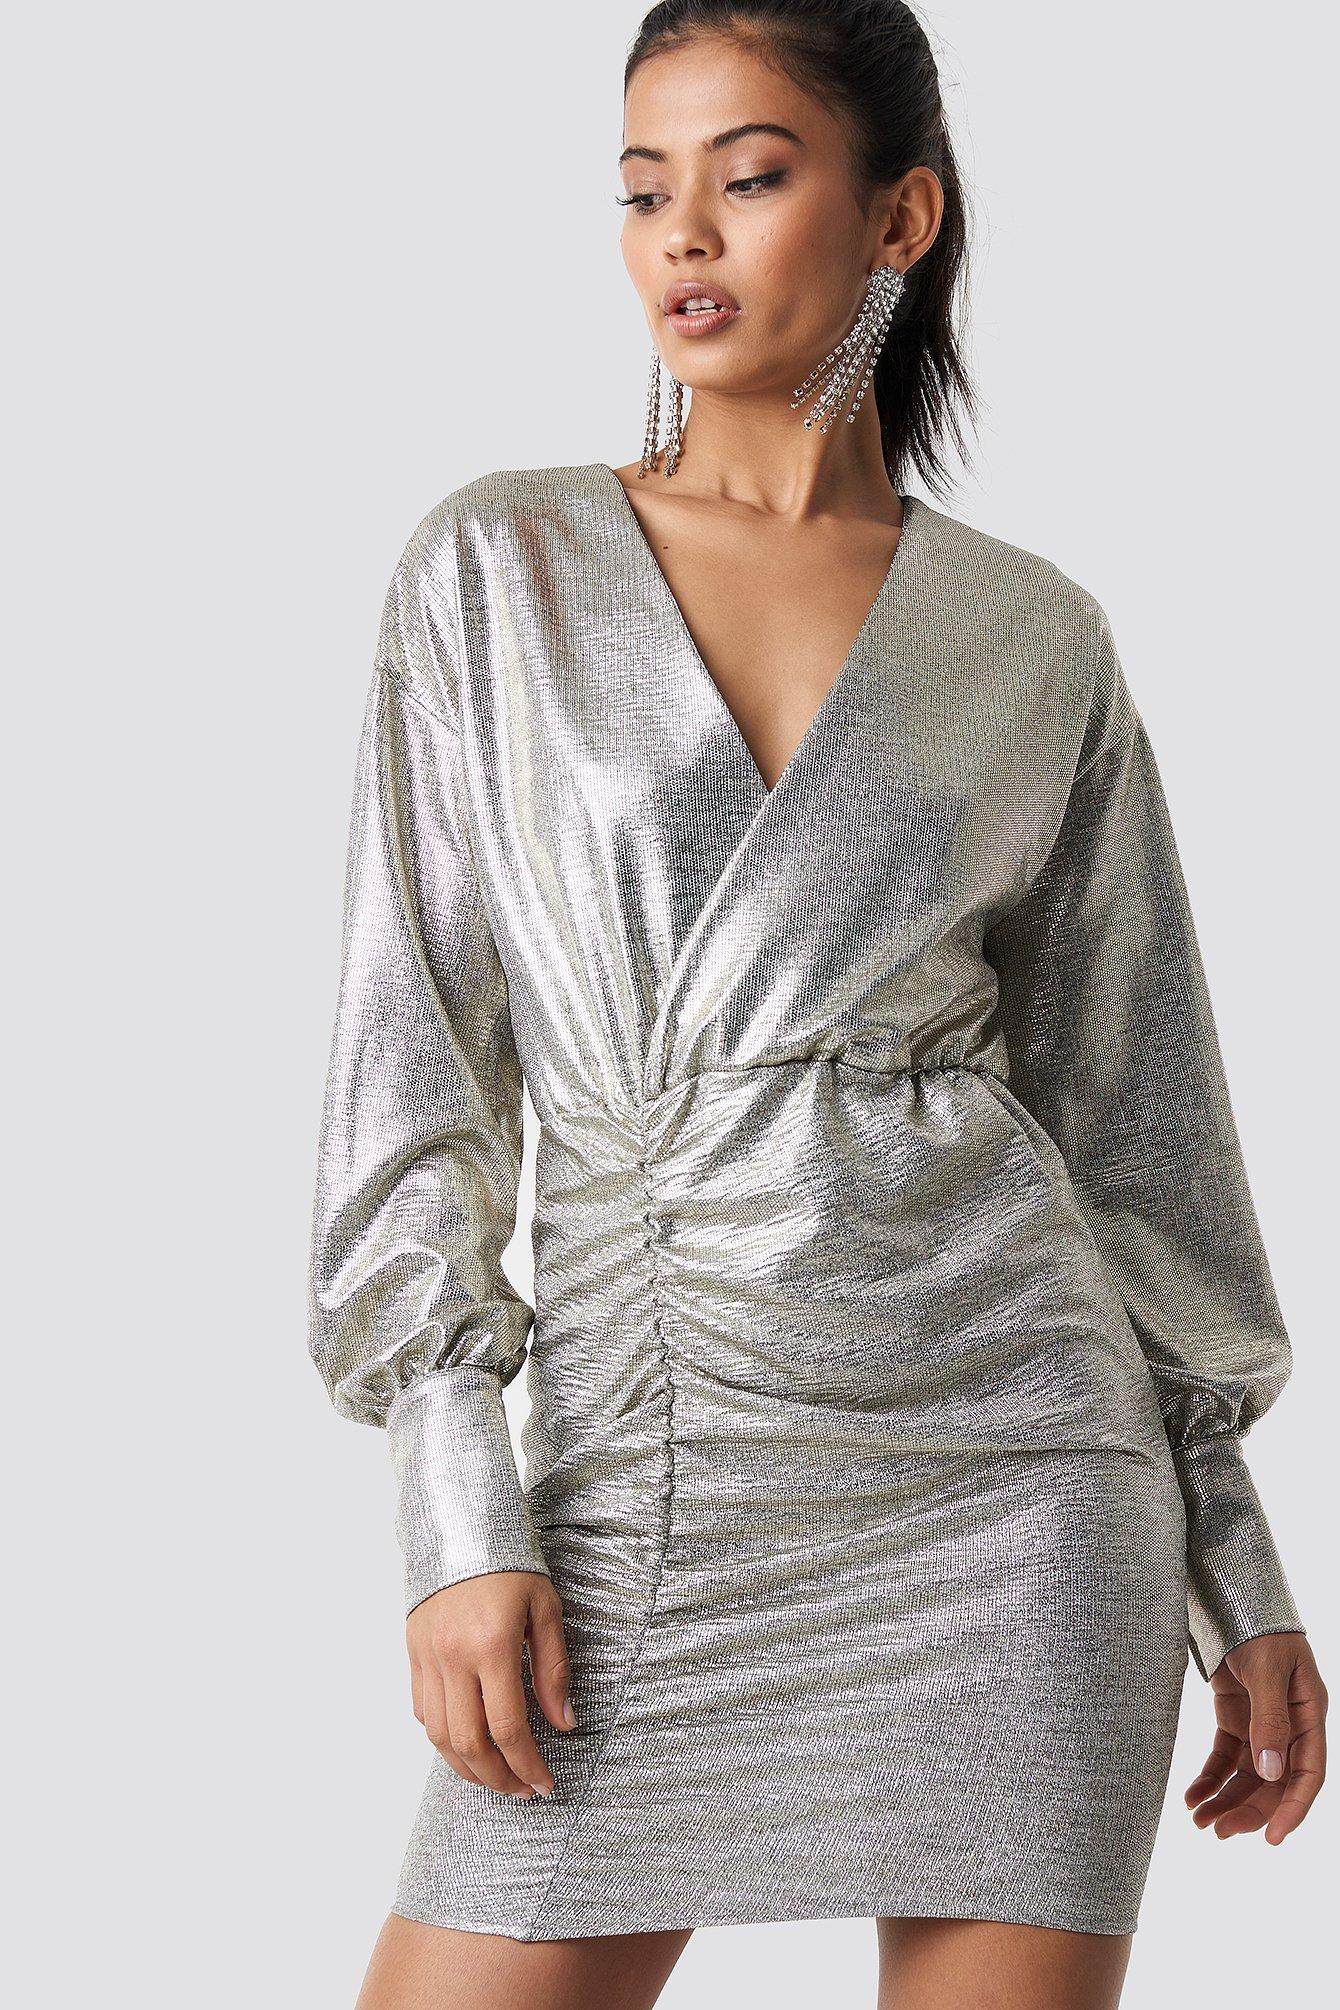 hannalicious x na-kd -  Draped Short Metallic Dress - Silver